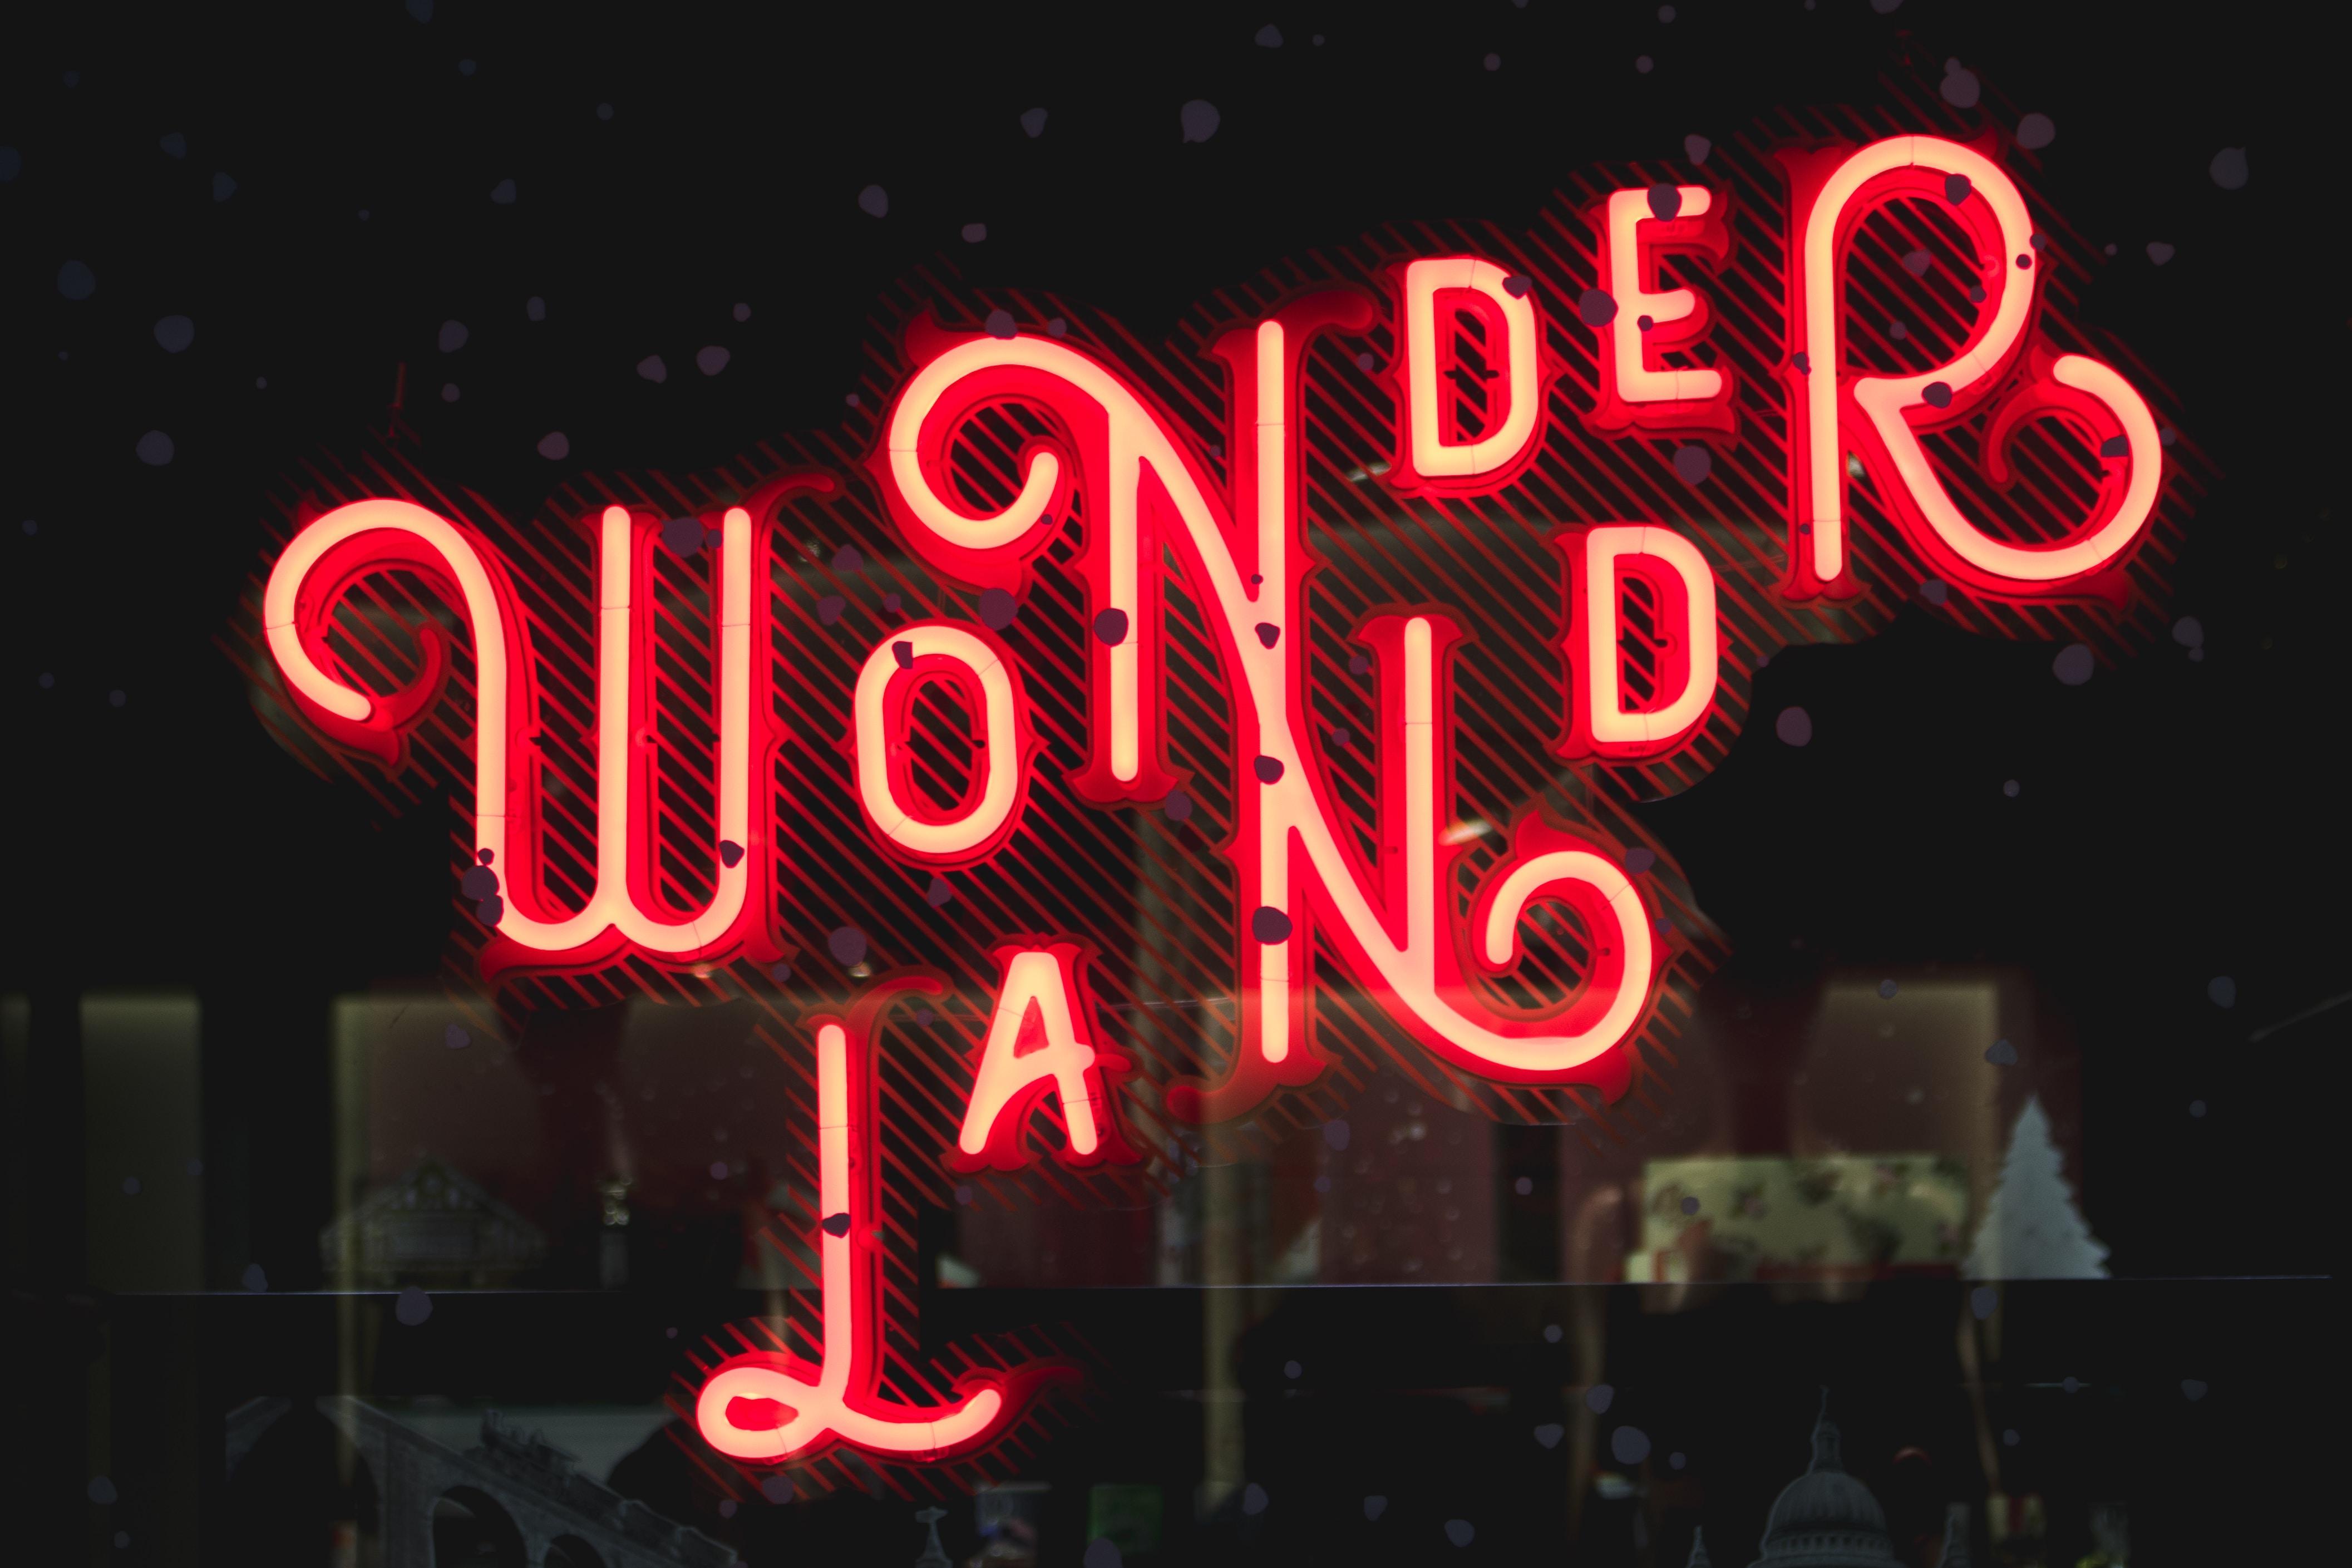 Wonderland neon signage at night